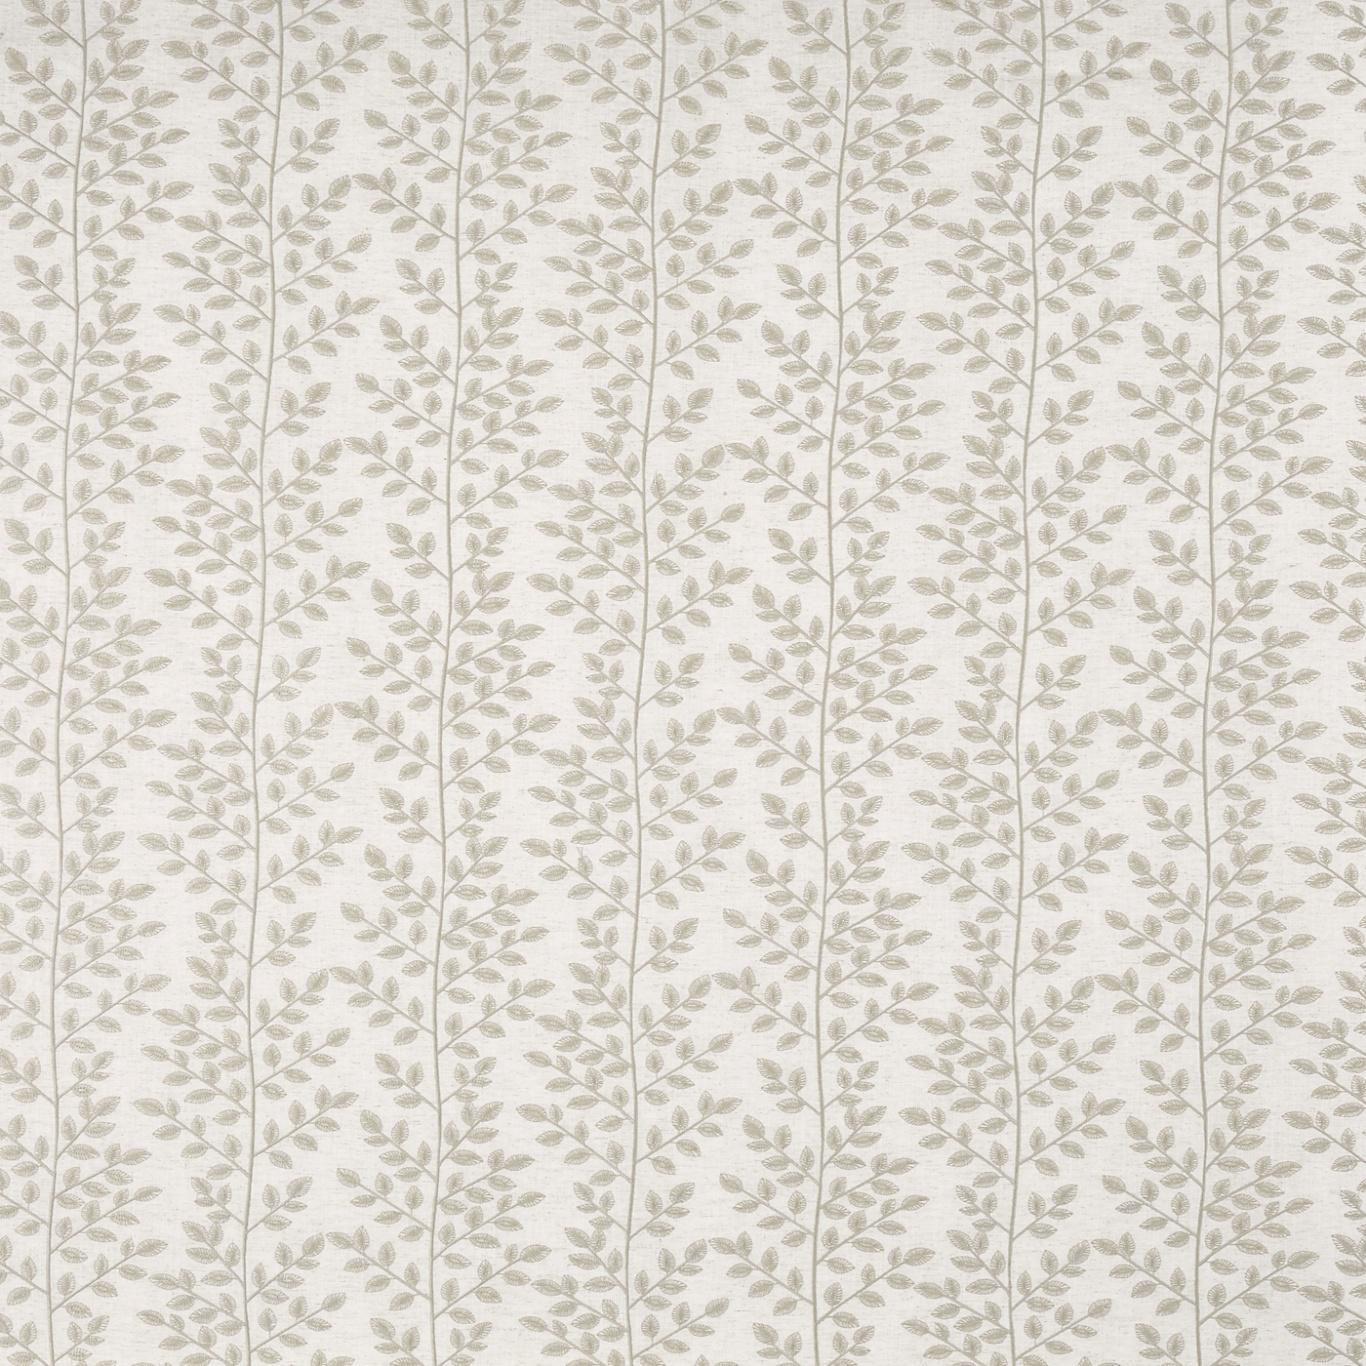 Image of Prestigious Evesham Parchment Fabric 3758/022